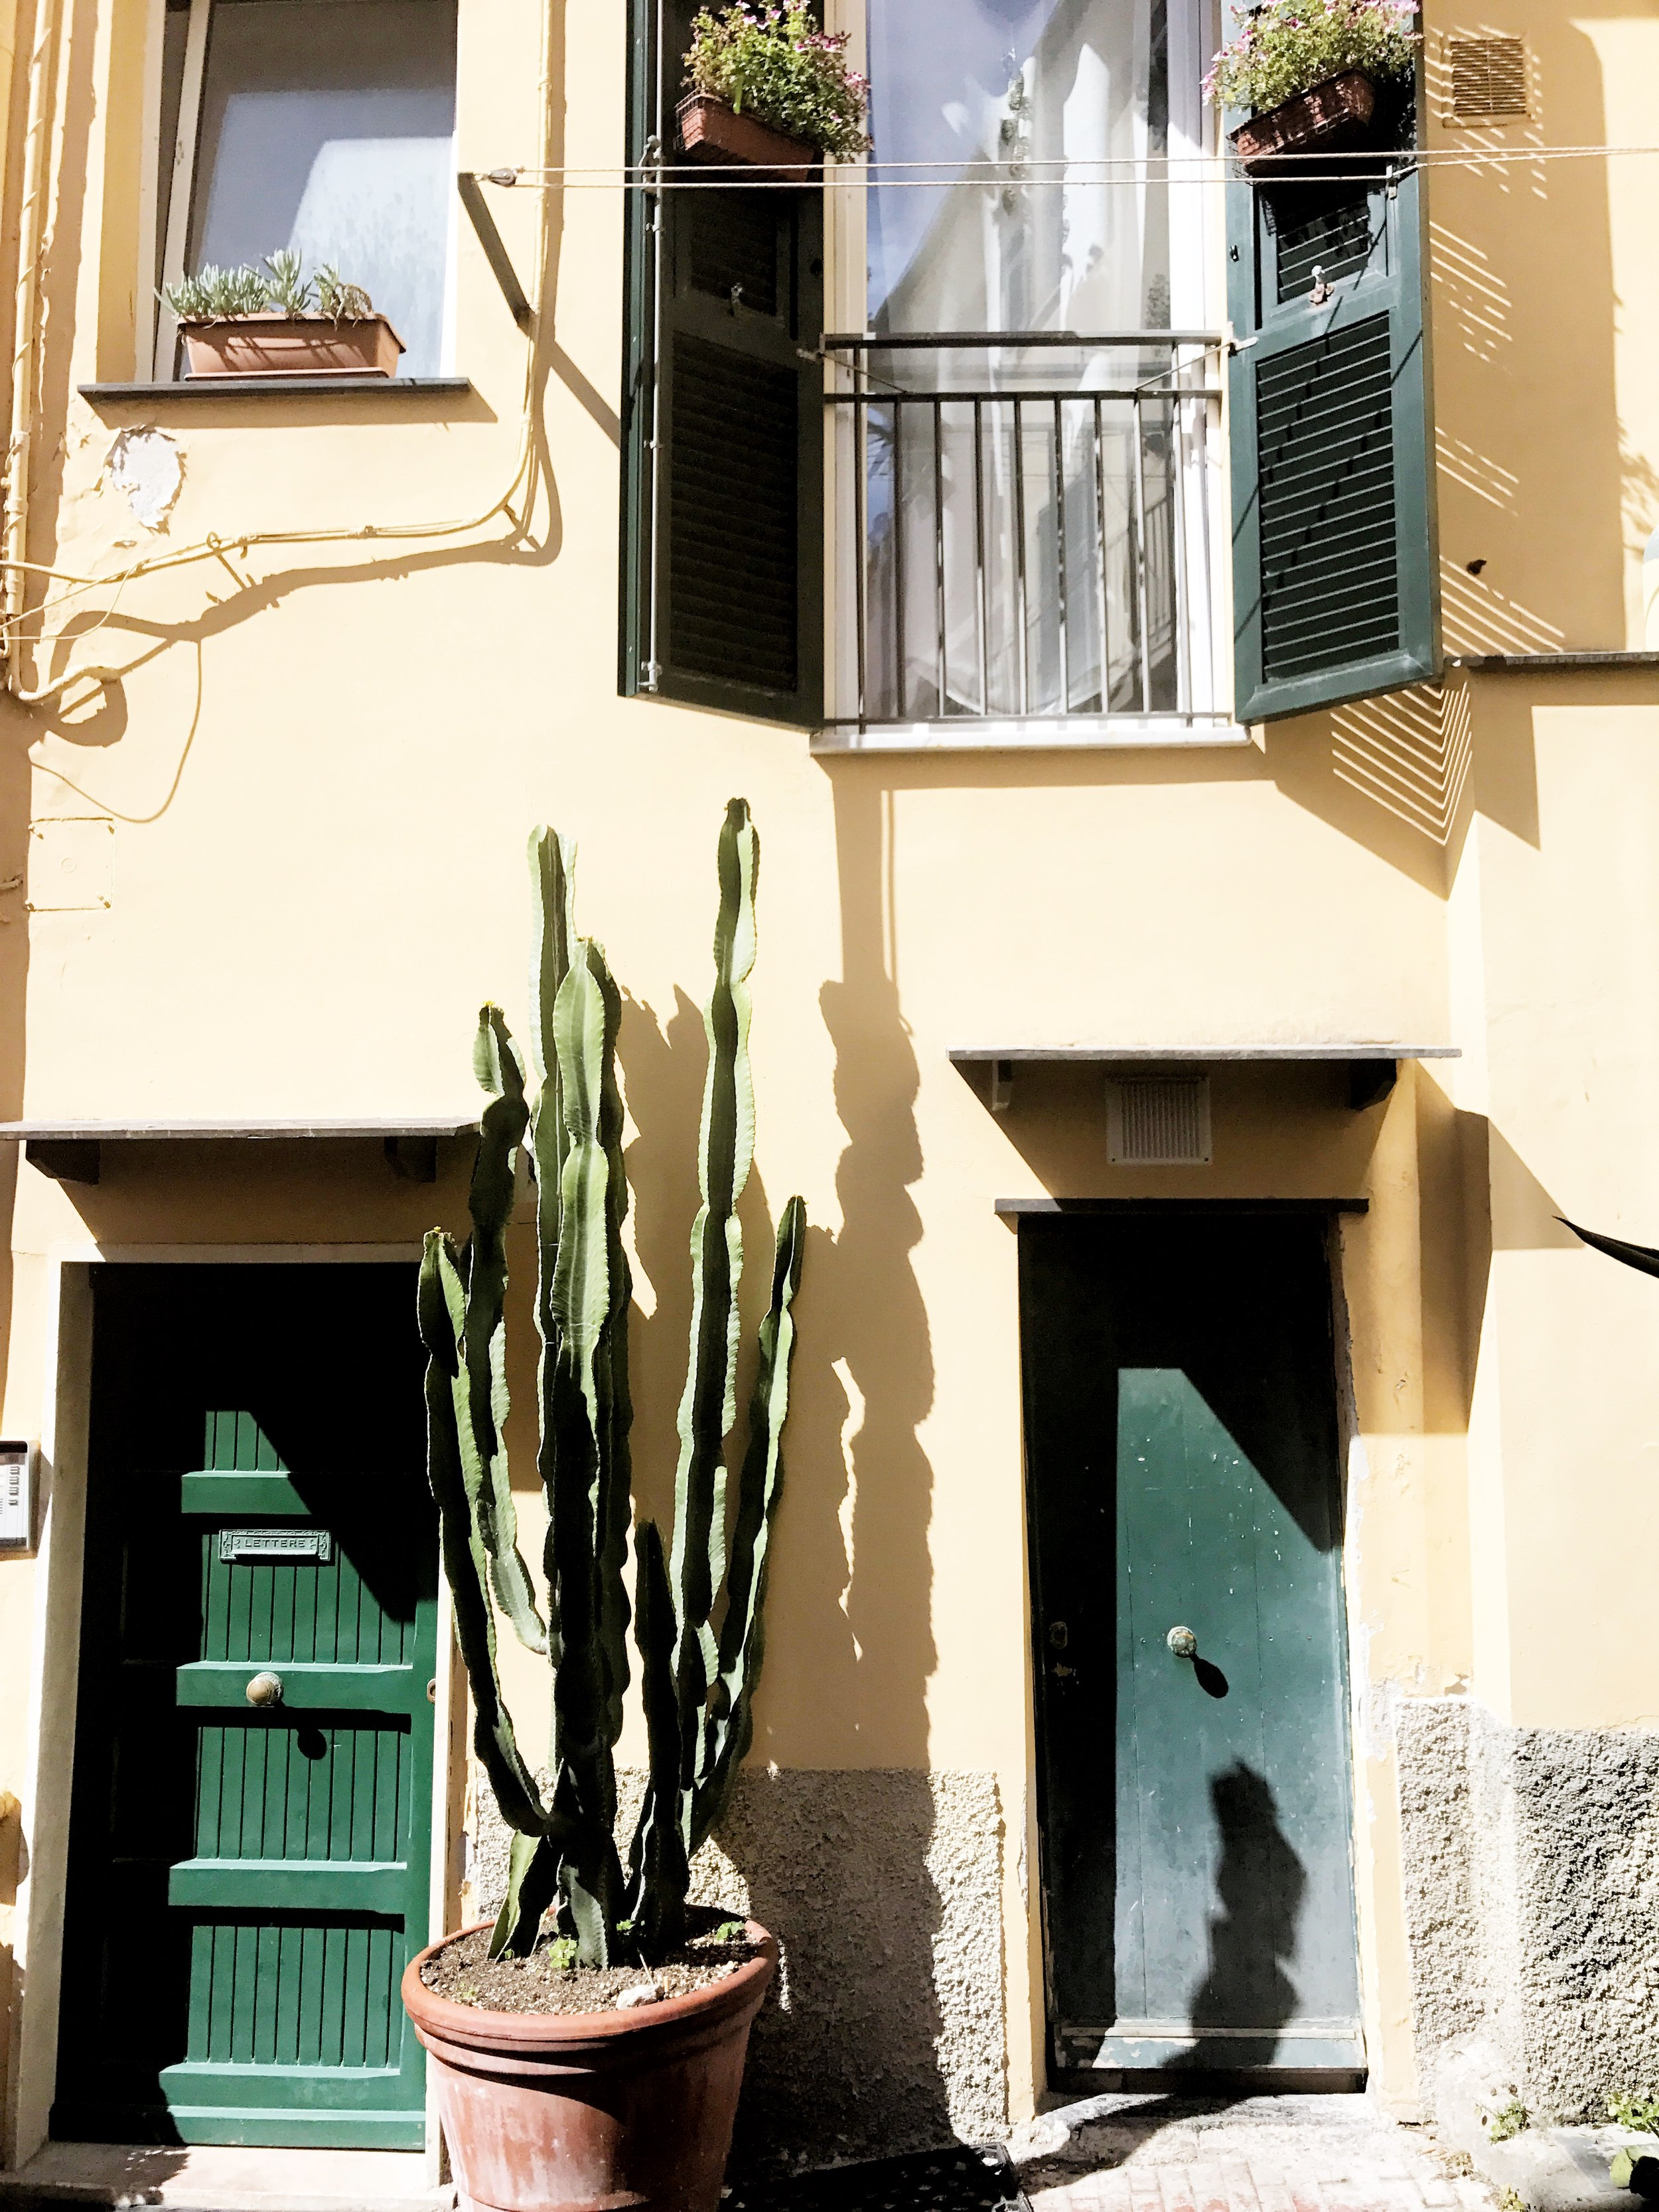 Cactus friends in Boccadasse, a neighborhood in Genova, Italy